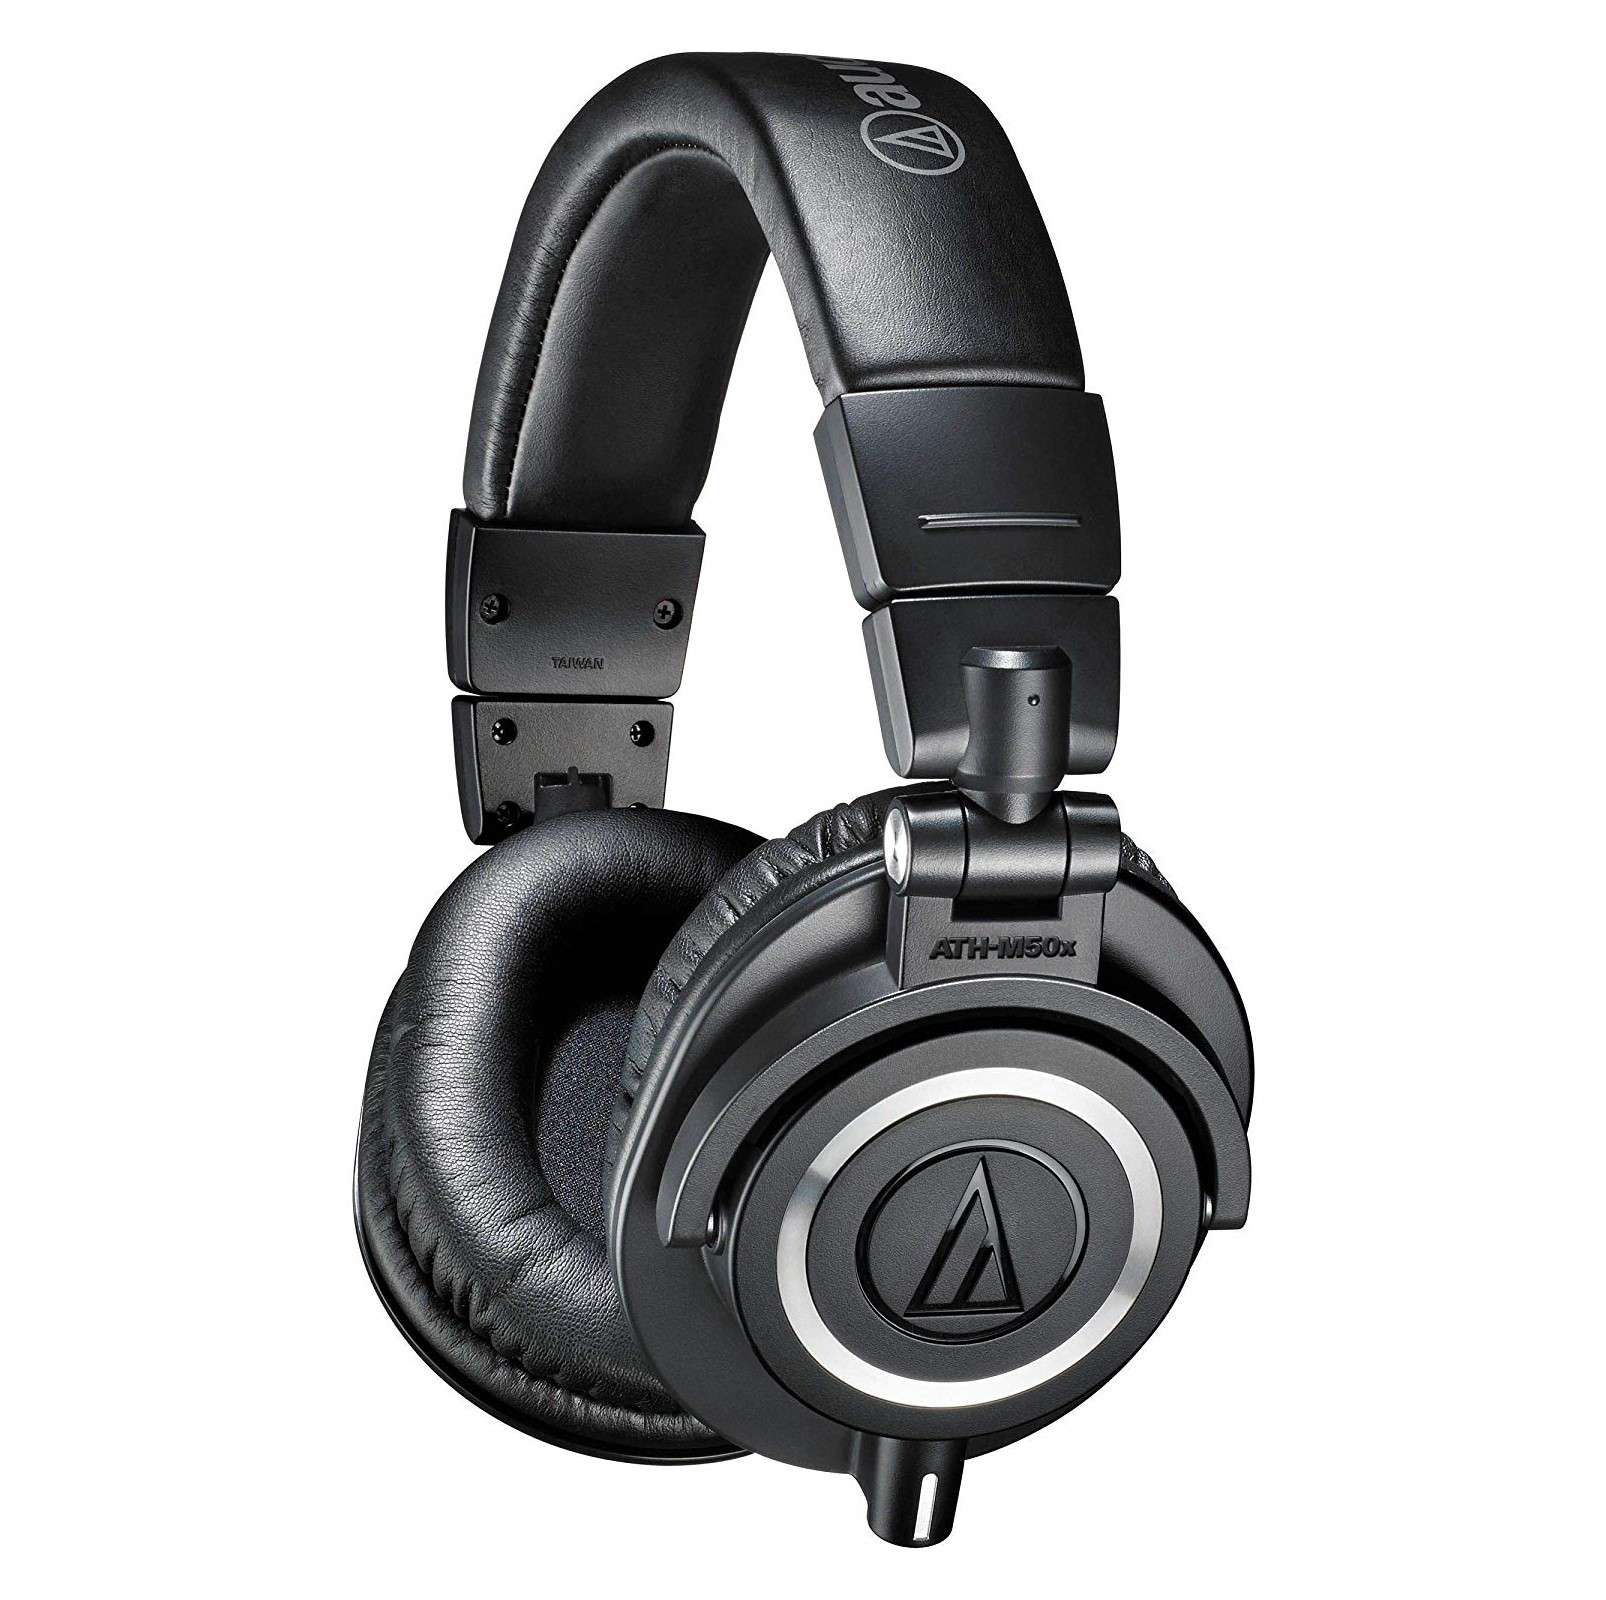 Audio Technica Pro ATH-M50X headphones